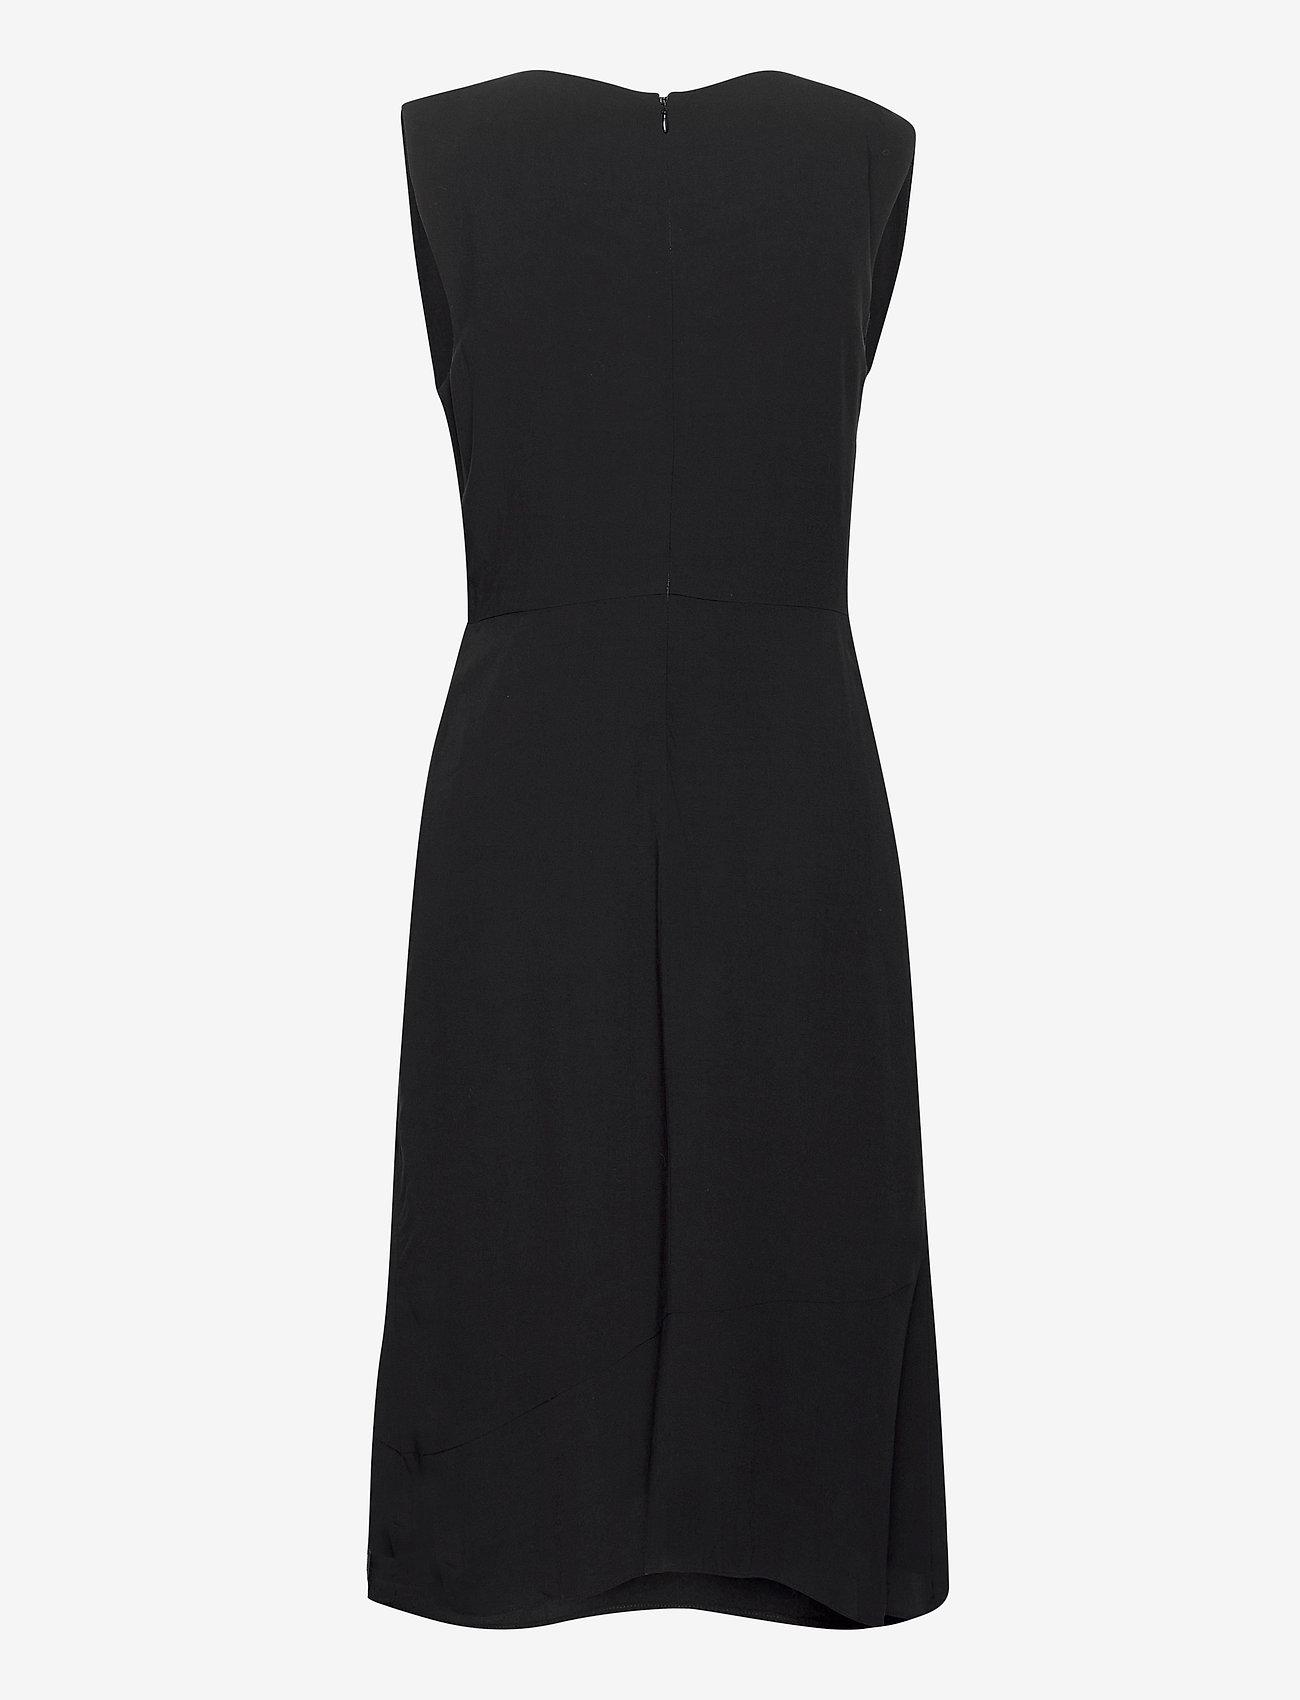 Superdry - ECOVERO TWIST DRESS - summer dresses - black - 1